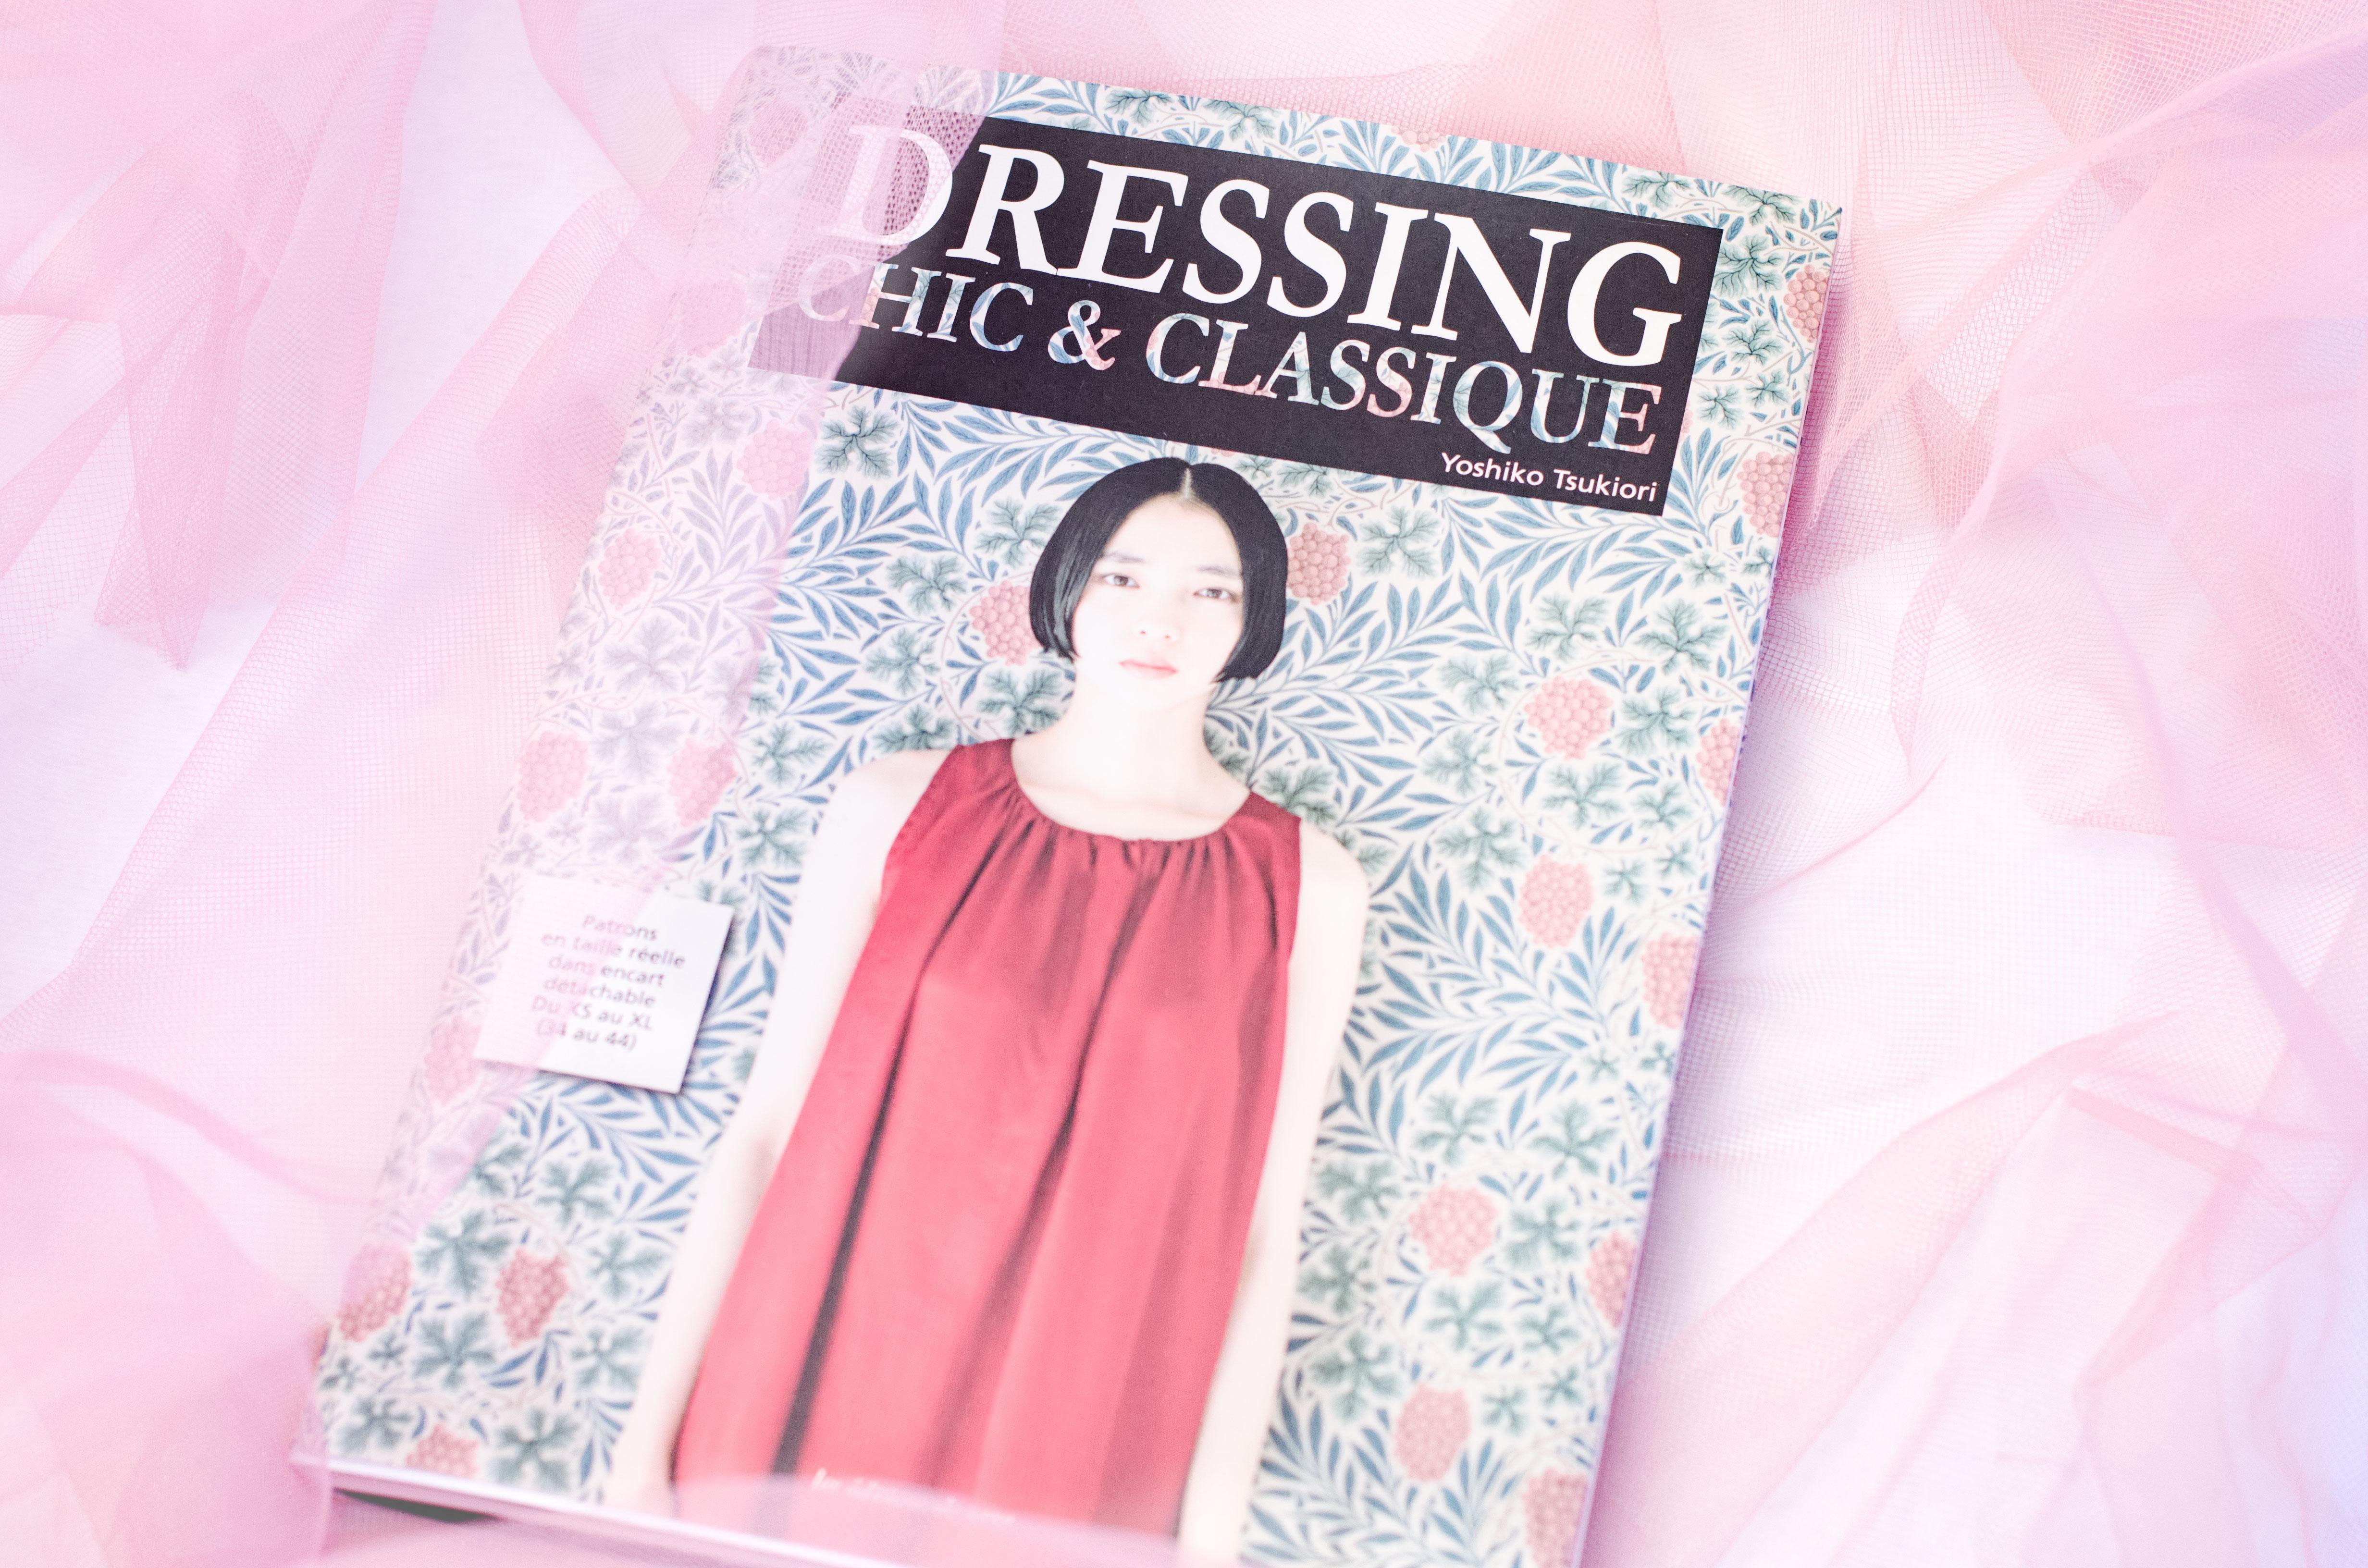 Dressing Chic et Classique de Yoshiko Tsukiori